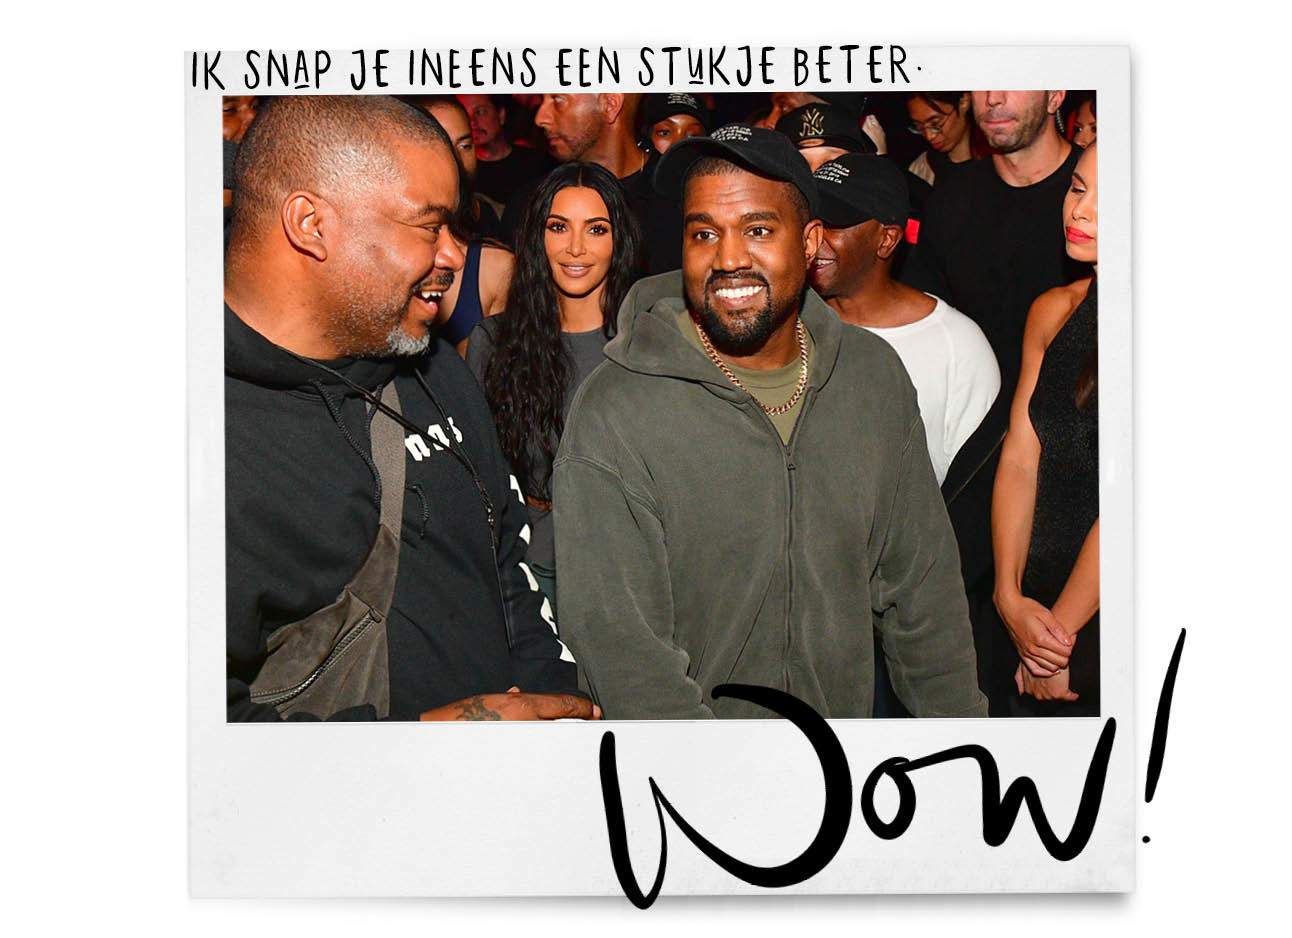 kanye west lachend tijdens een feest met Kim kardashian